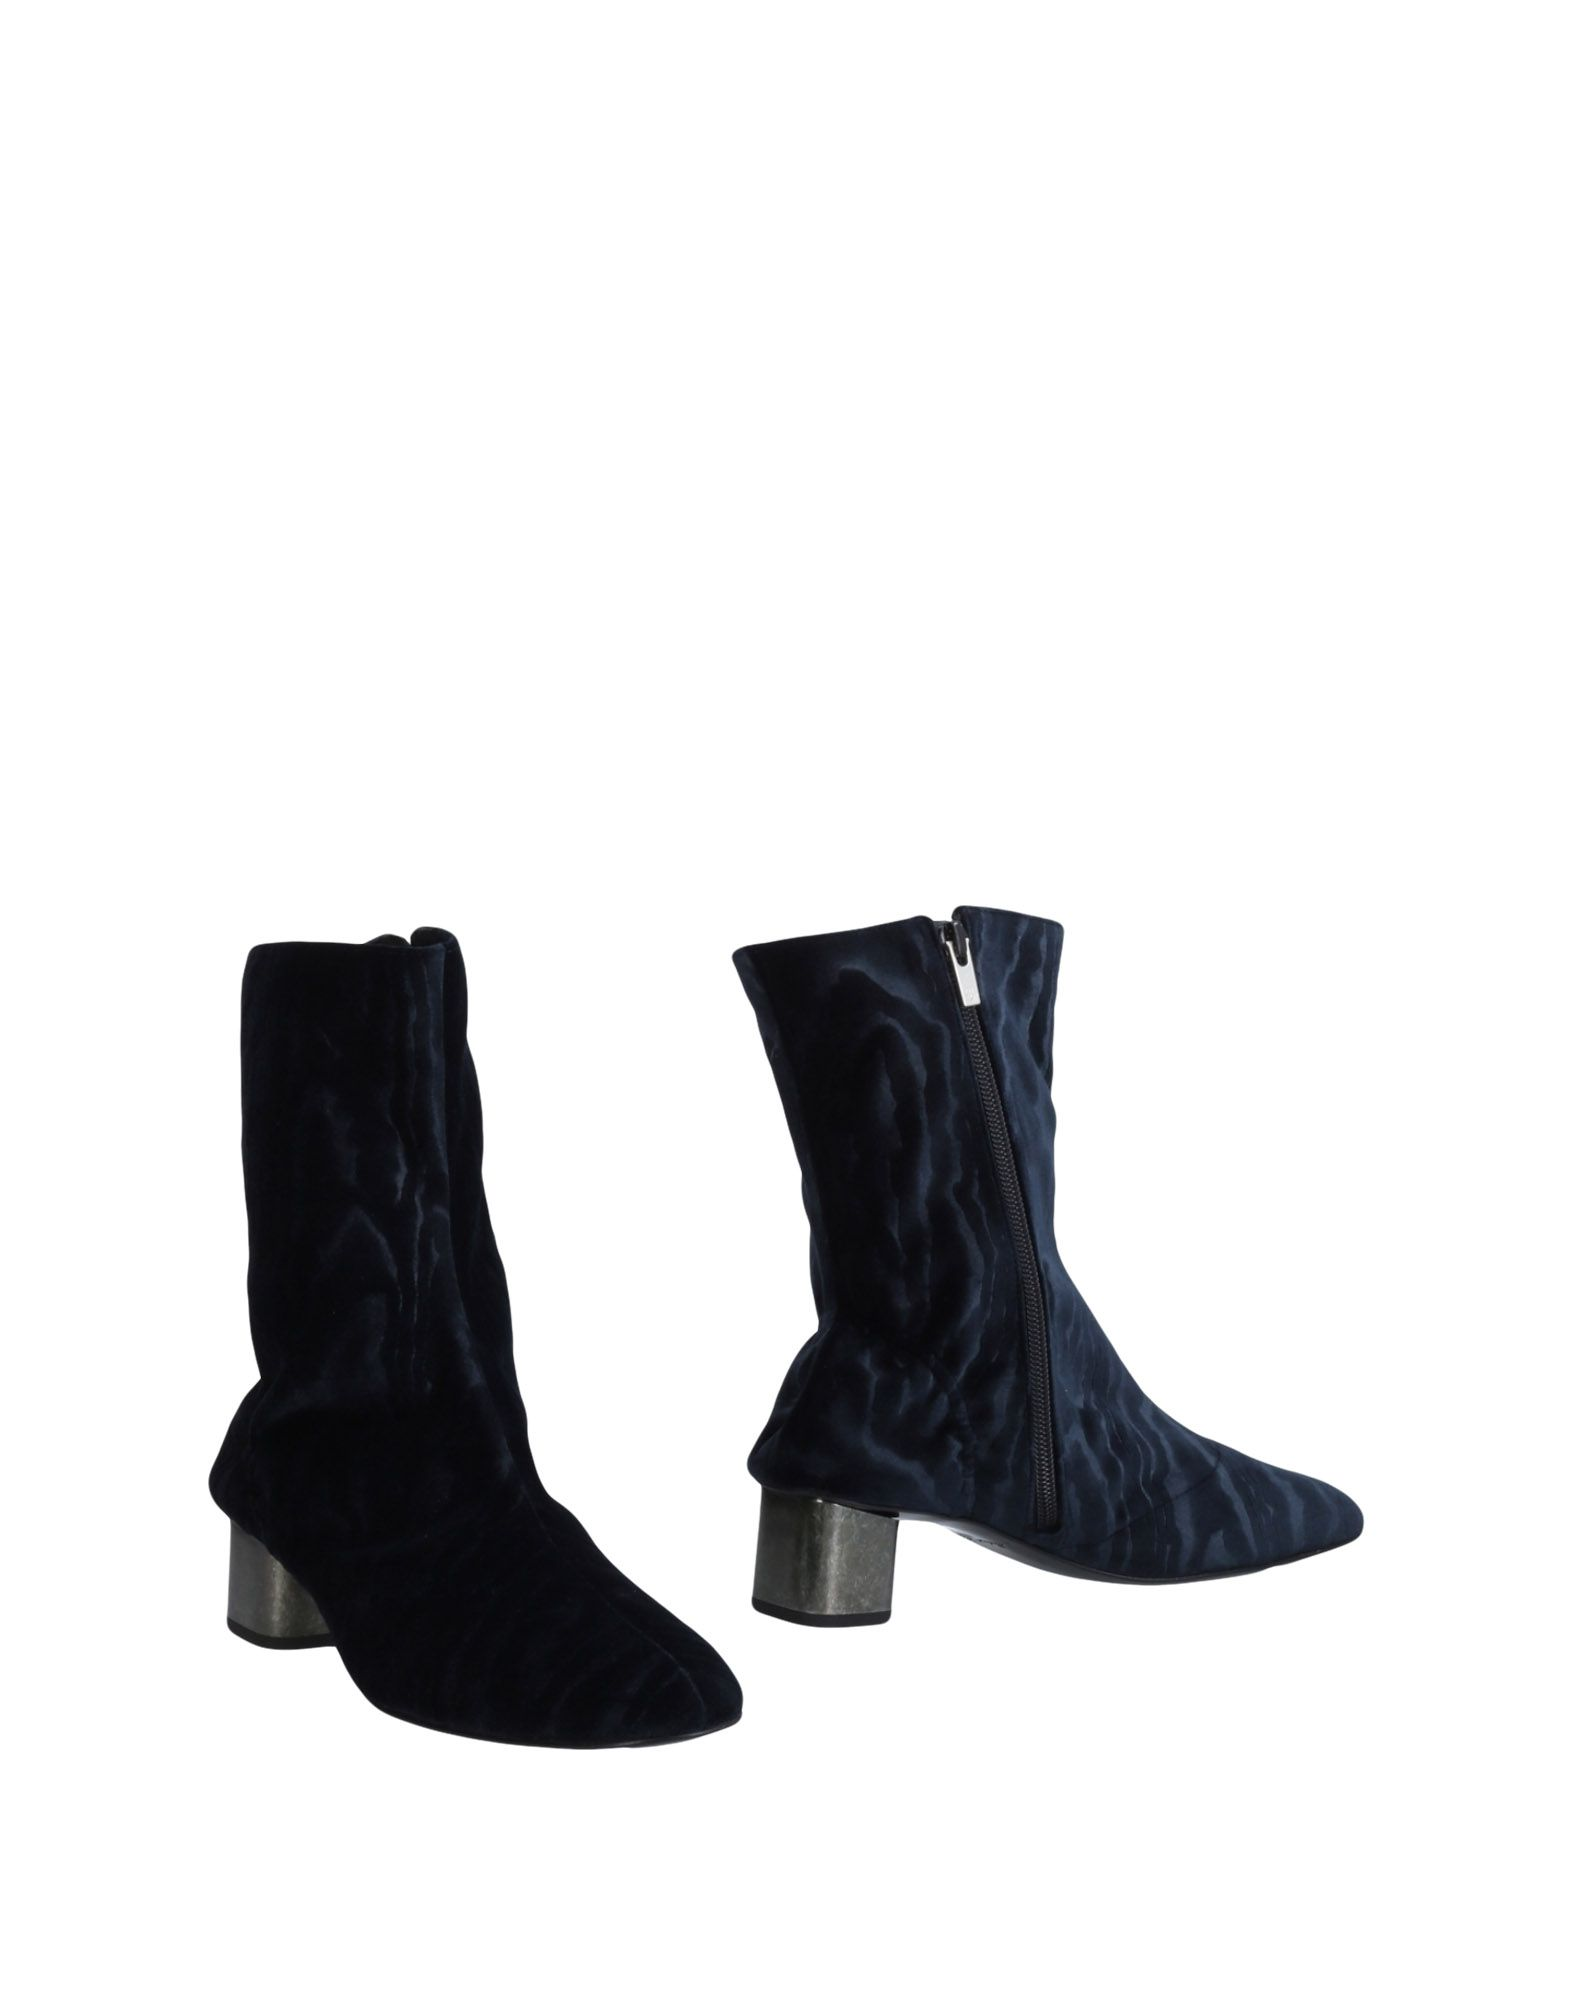 Rabatt Schuhe Robert Clergerie Stiefelette 11454130WC Damen  11454130WC Stiefelette 50a933